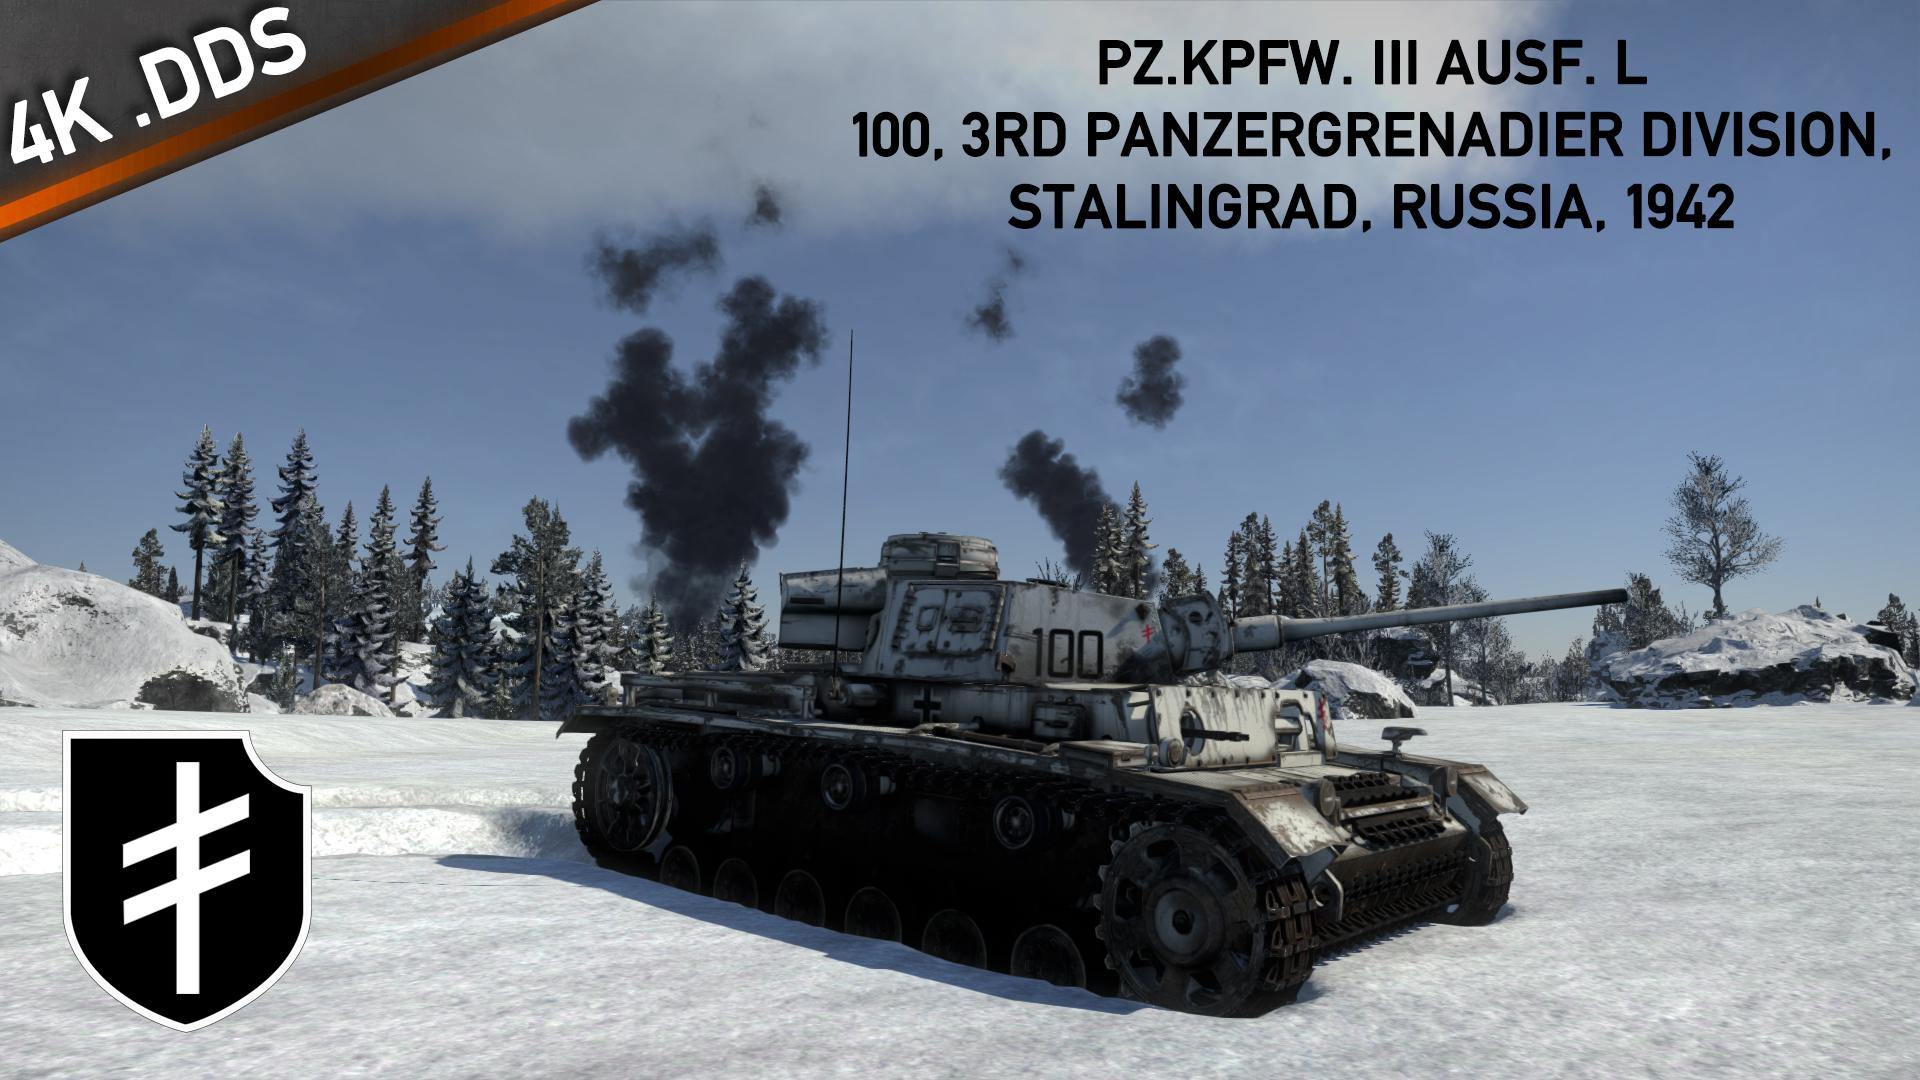 [War Thunder Skin] Pz. III Ausf. L, 100, 1942 by zFireWyvern on DeviantArt